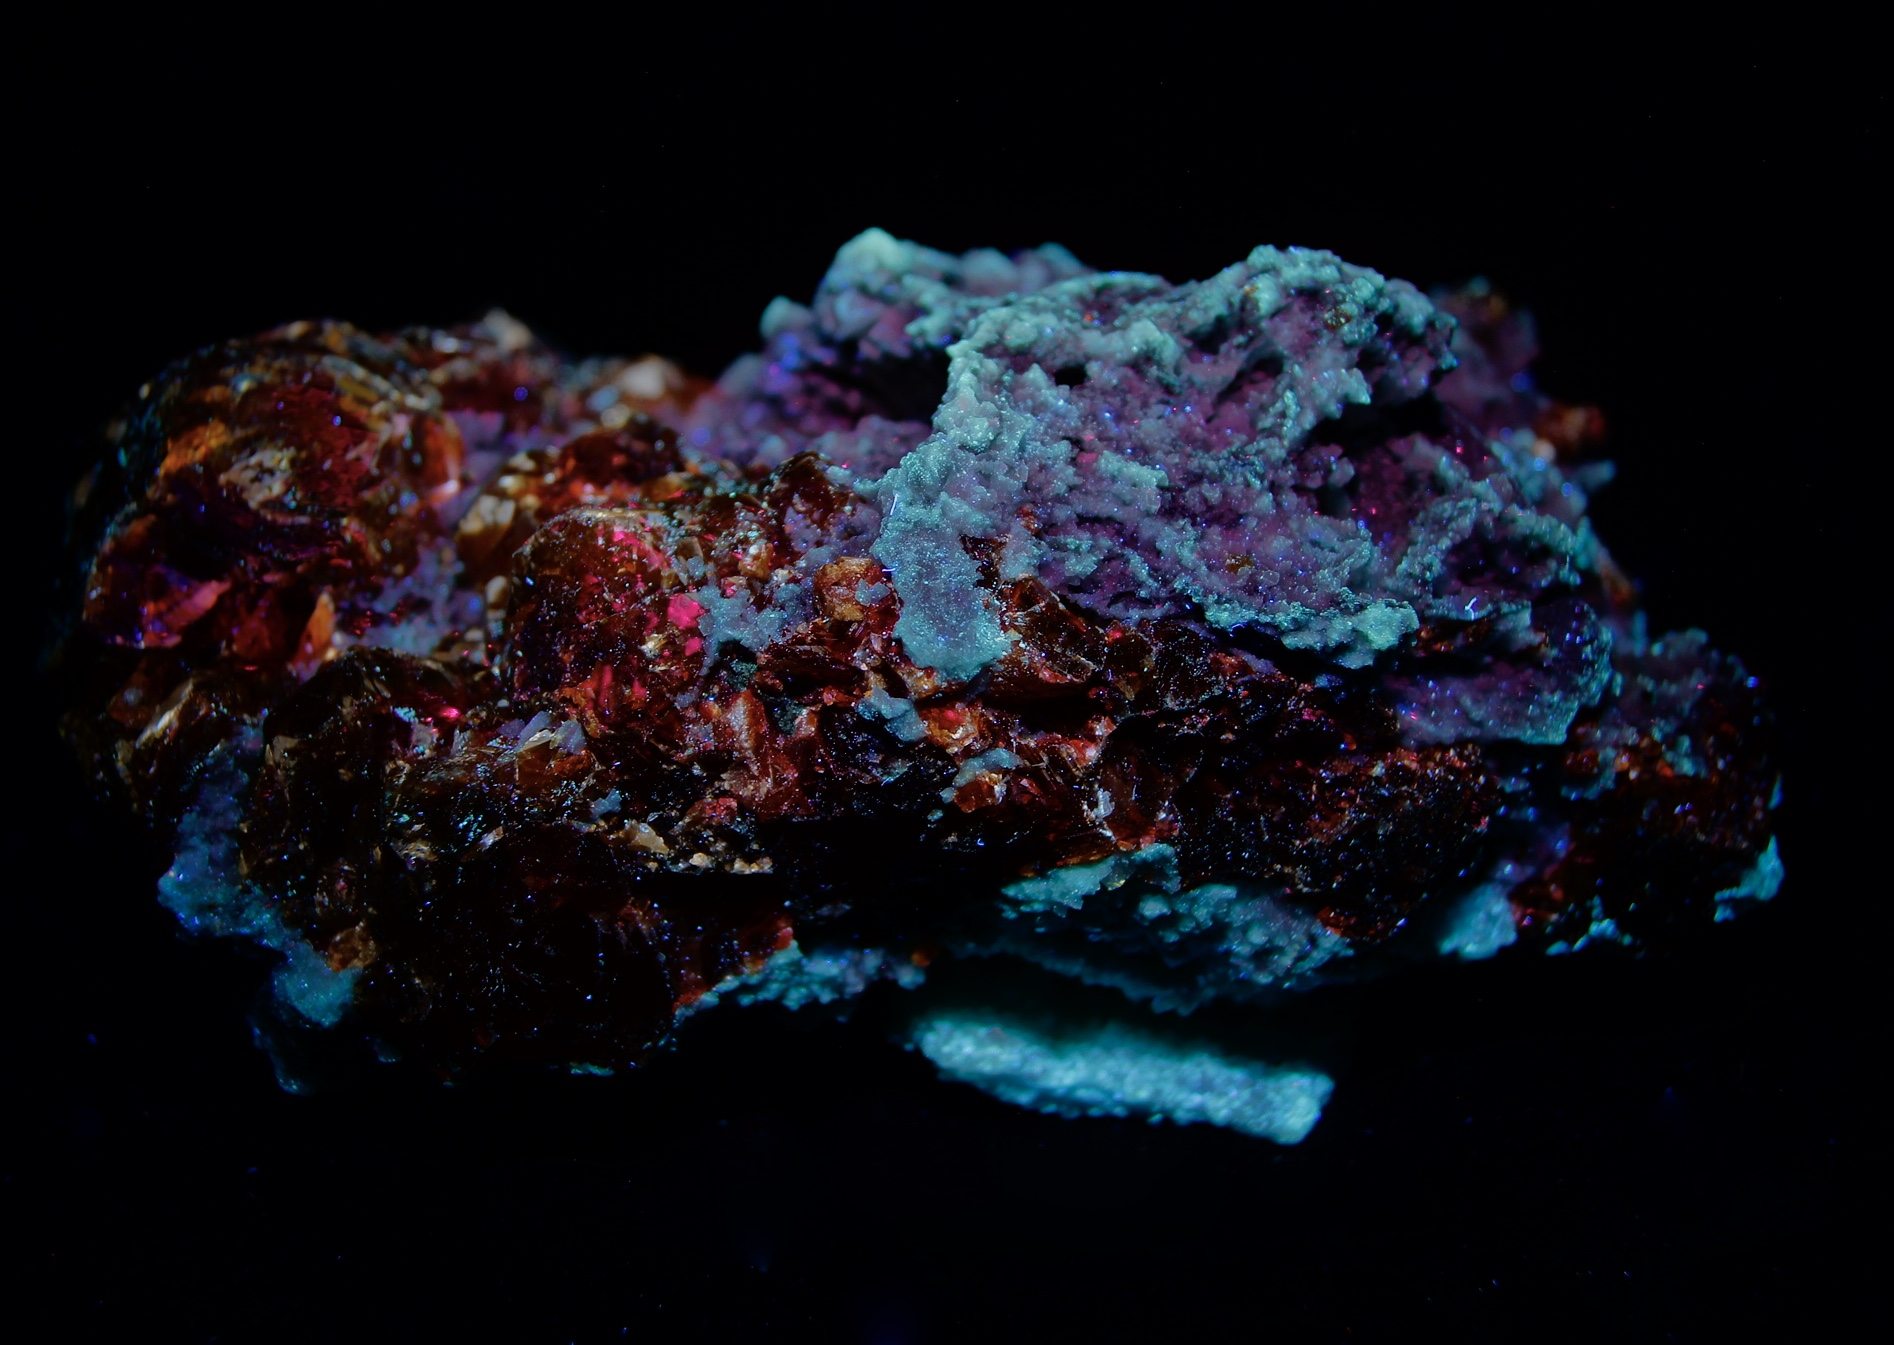 Colección de Minerales Fluorescentes - Página 5 Fullsi57